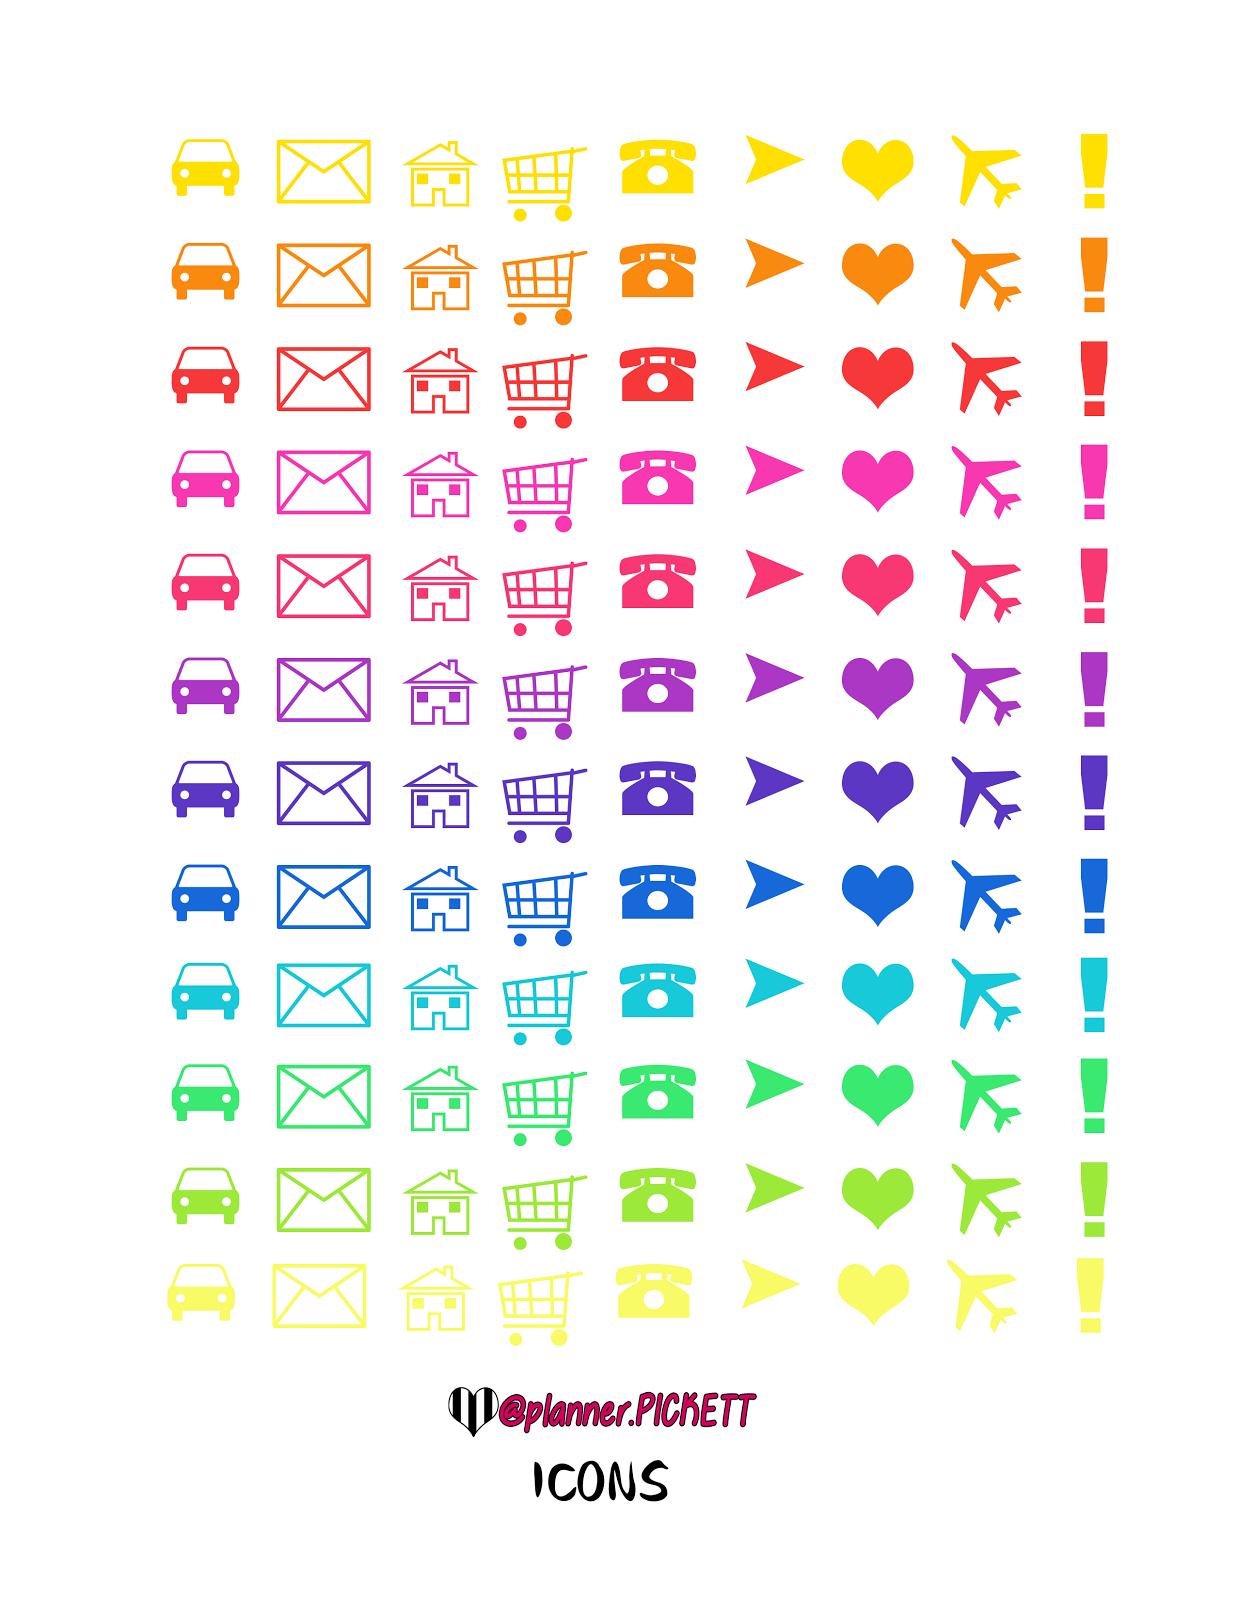 Pinheather Adams On Planning   Printable Planner Stickers - Free Printable Icons